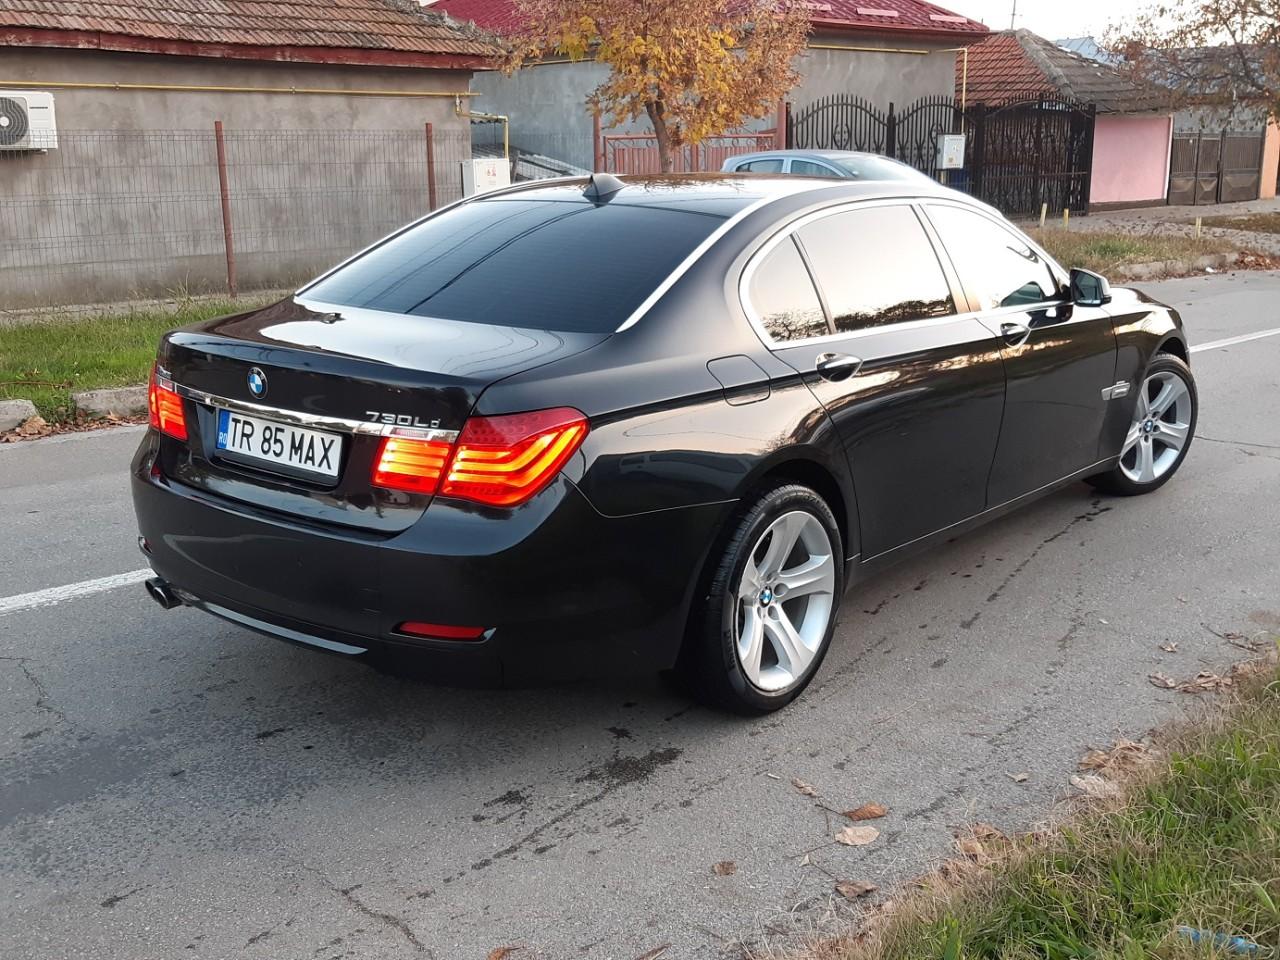 BMW 730 3.0 Diesel 2010